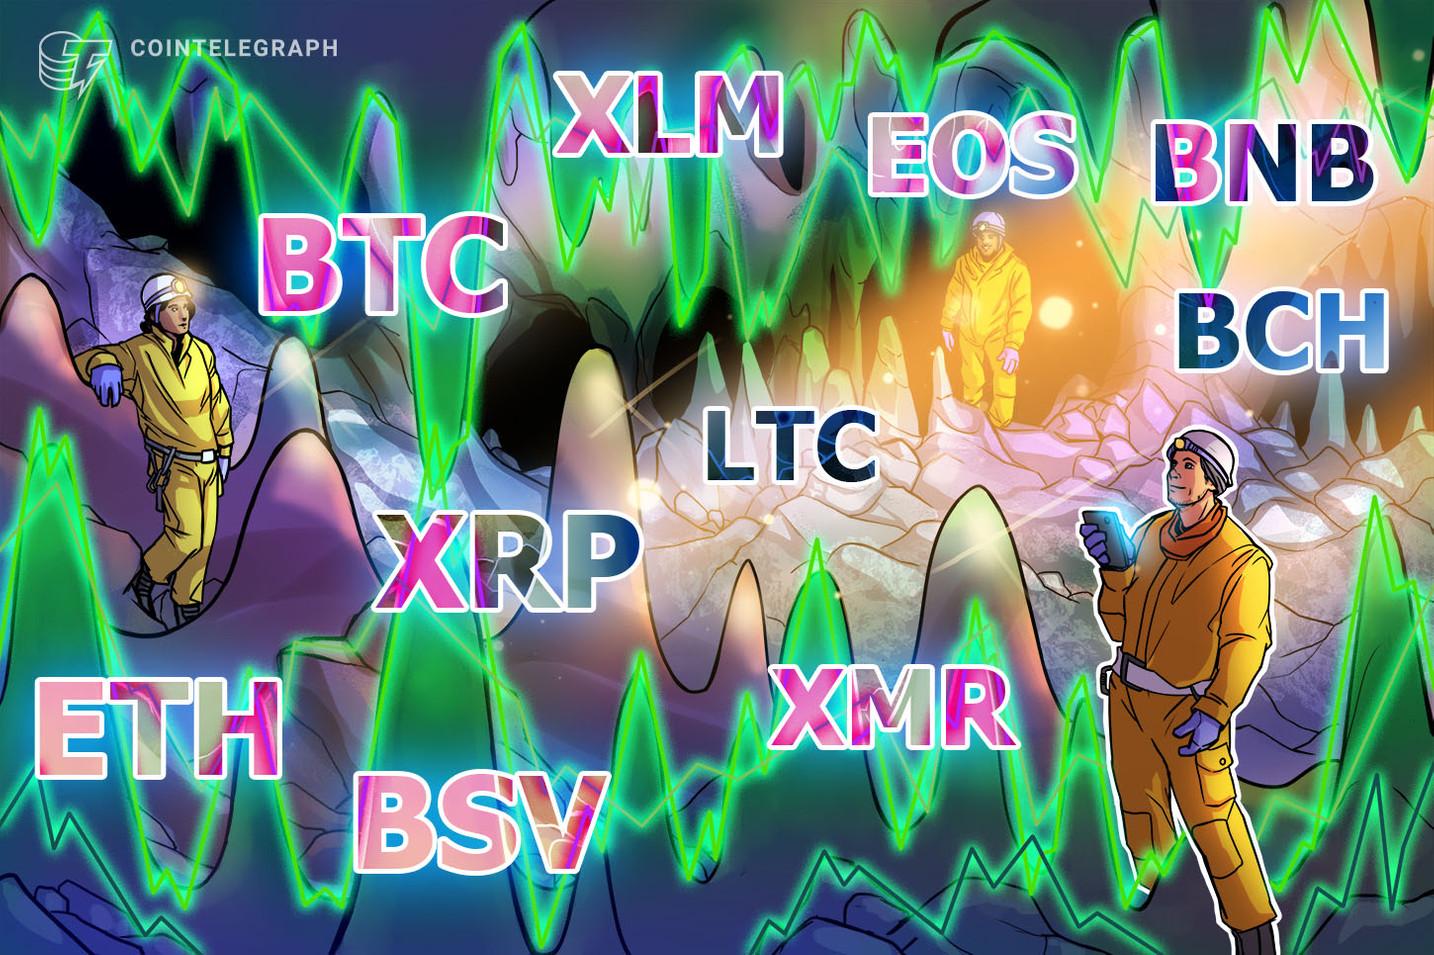 Analisi dei prezzi 17/08: BTC, ETH, XRP, BCH, LTC, BNB, EOS, BSV, XMR, XLM